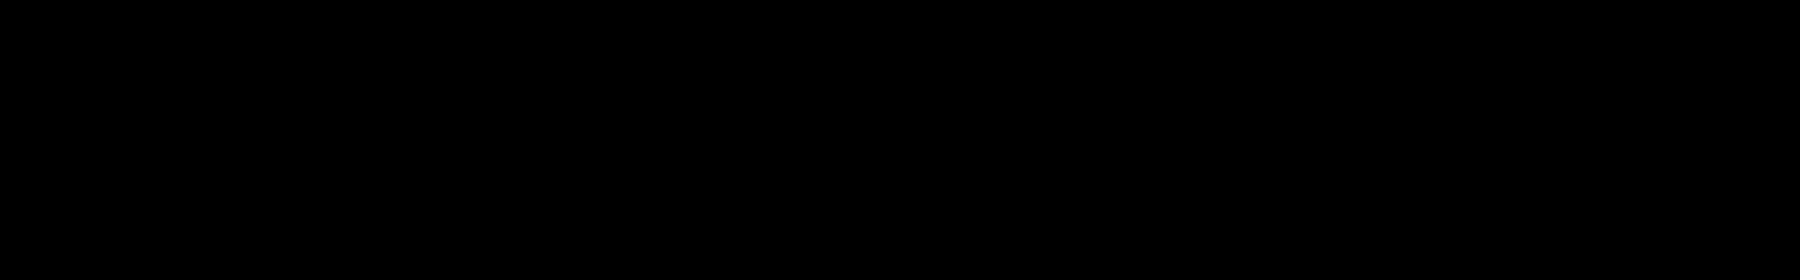 Serum SFX audio waveform